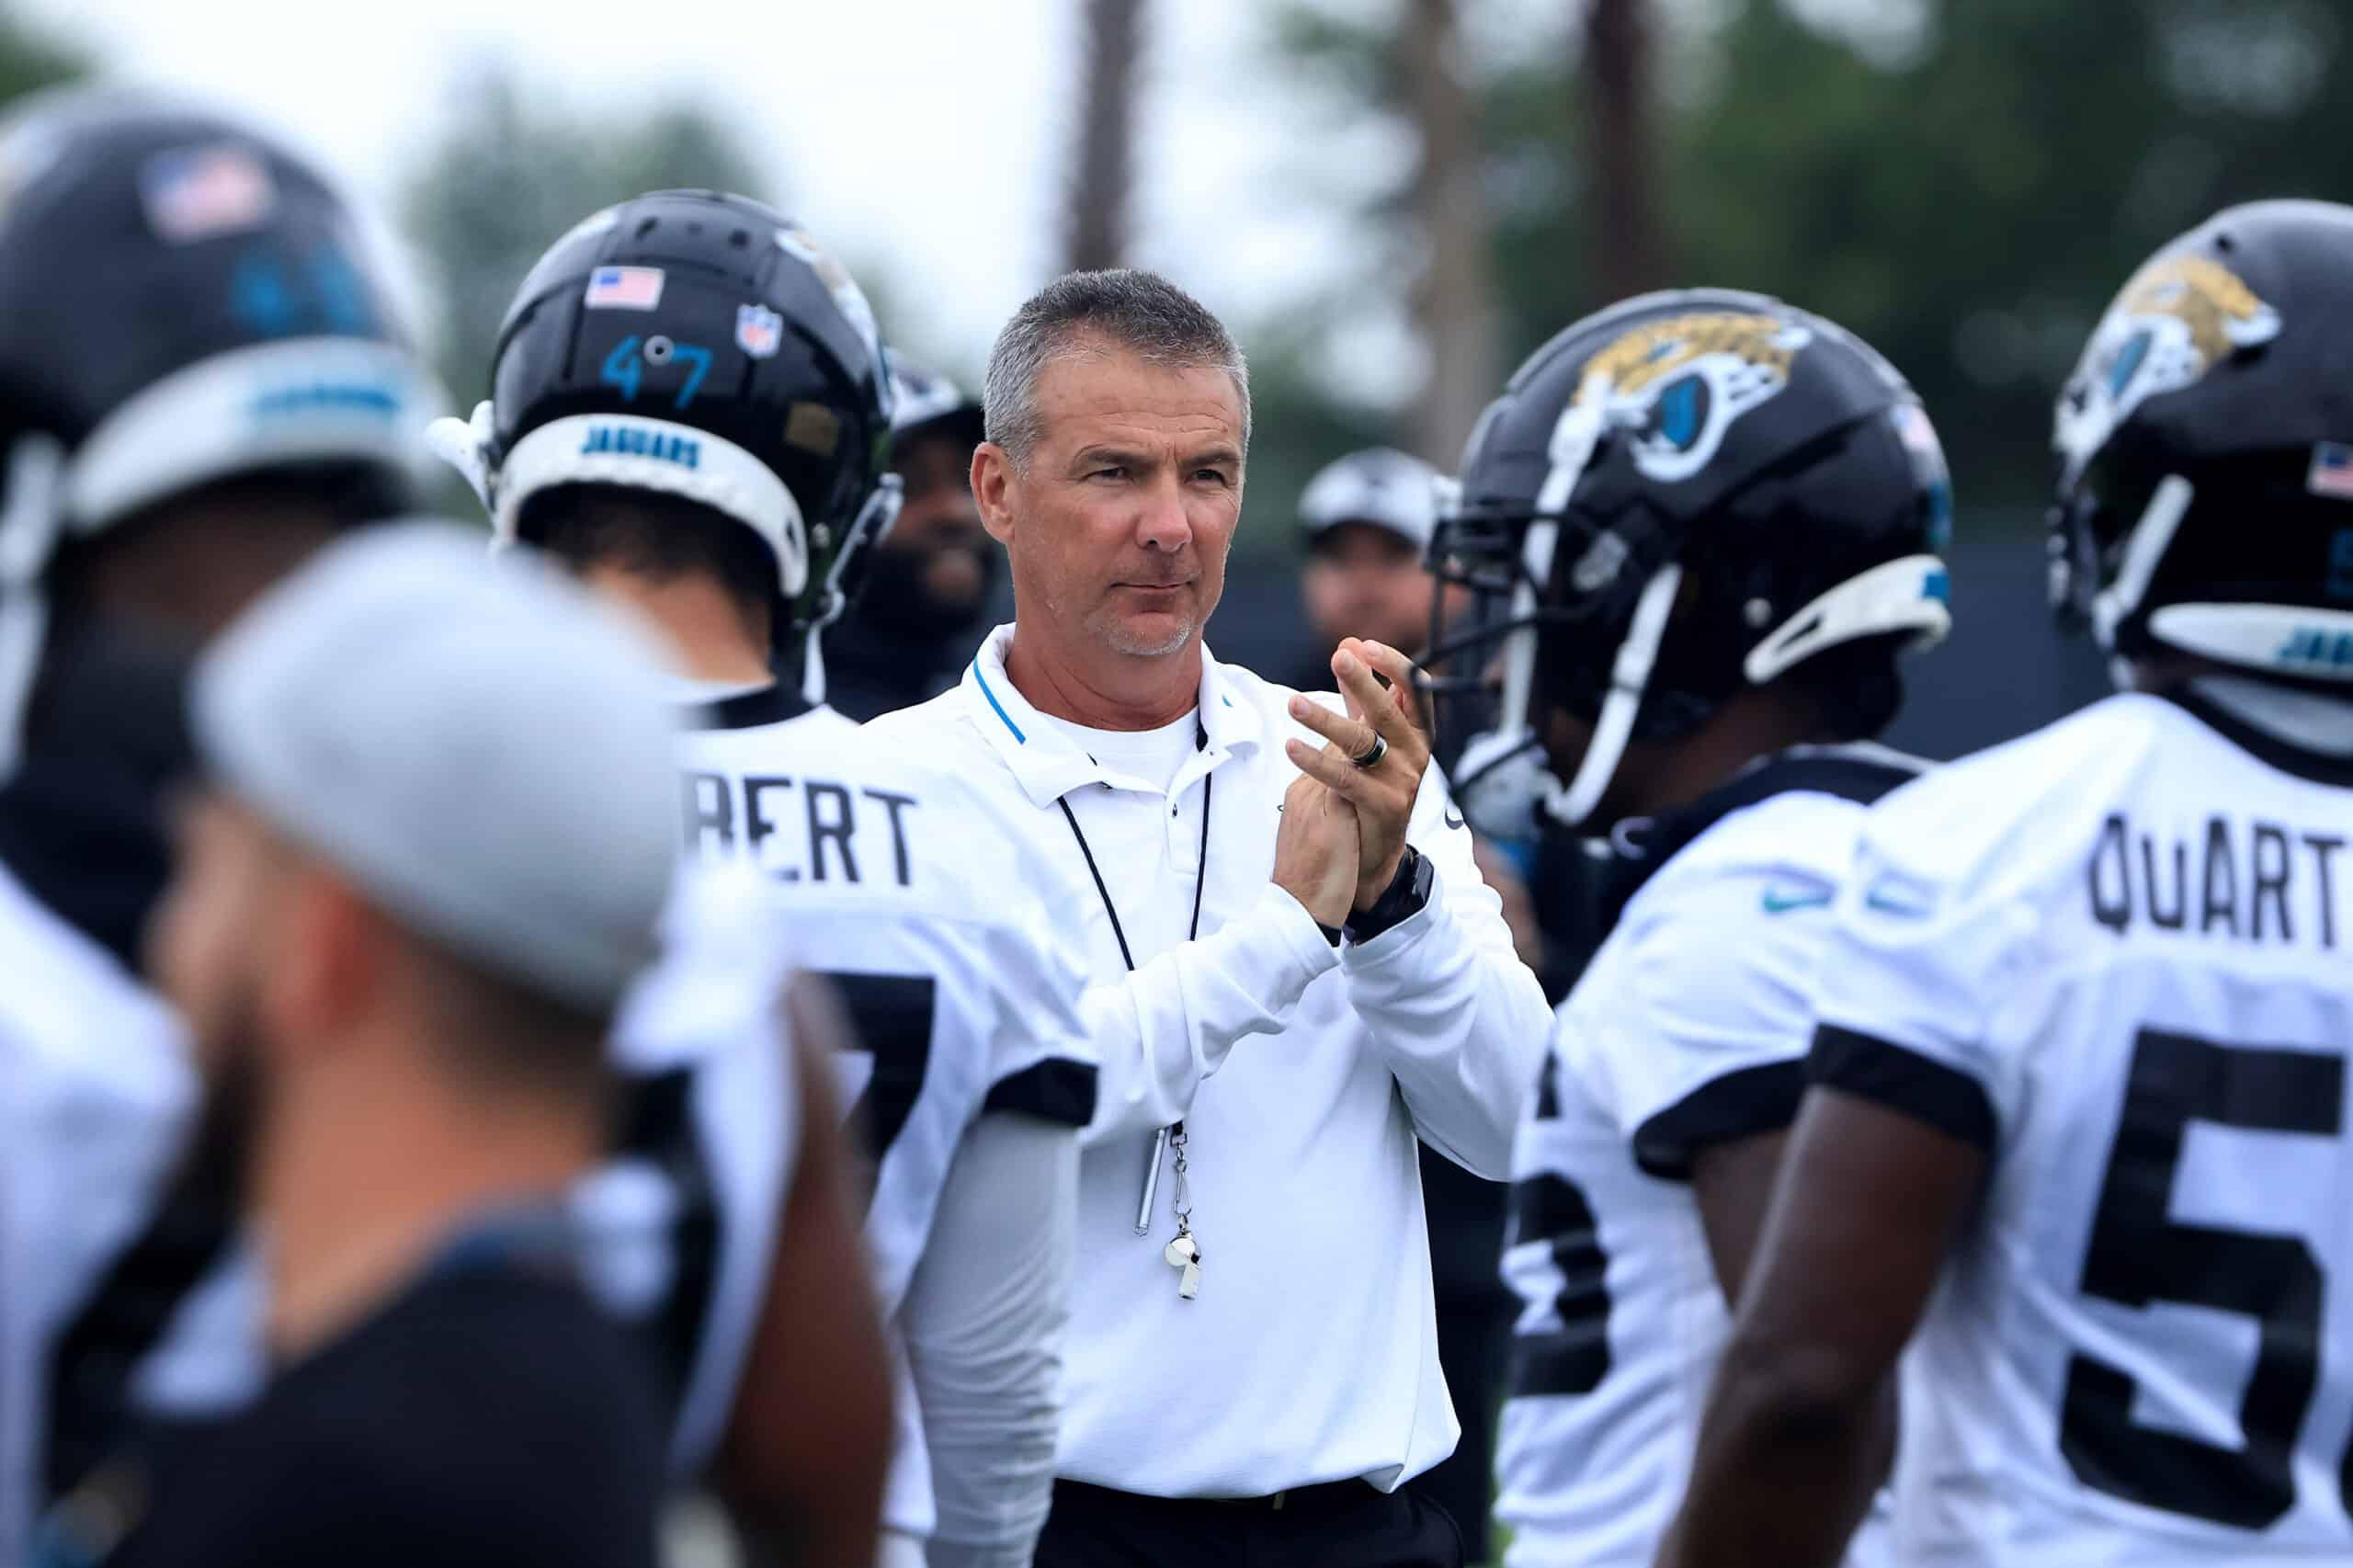 Head coach of the Jacksonville Jaguars Urban Meyer looks on during Jacksonville Jaguars Mandatory Minicamp at TIAA Bank Field on June 14, 2021 in Jacksonville, Florida.